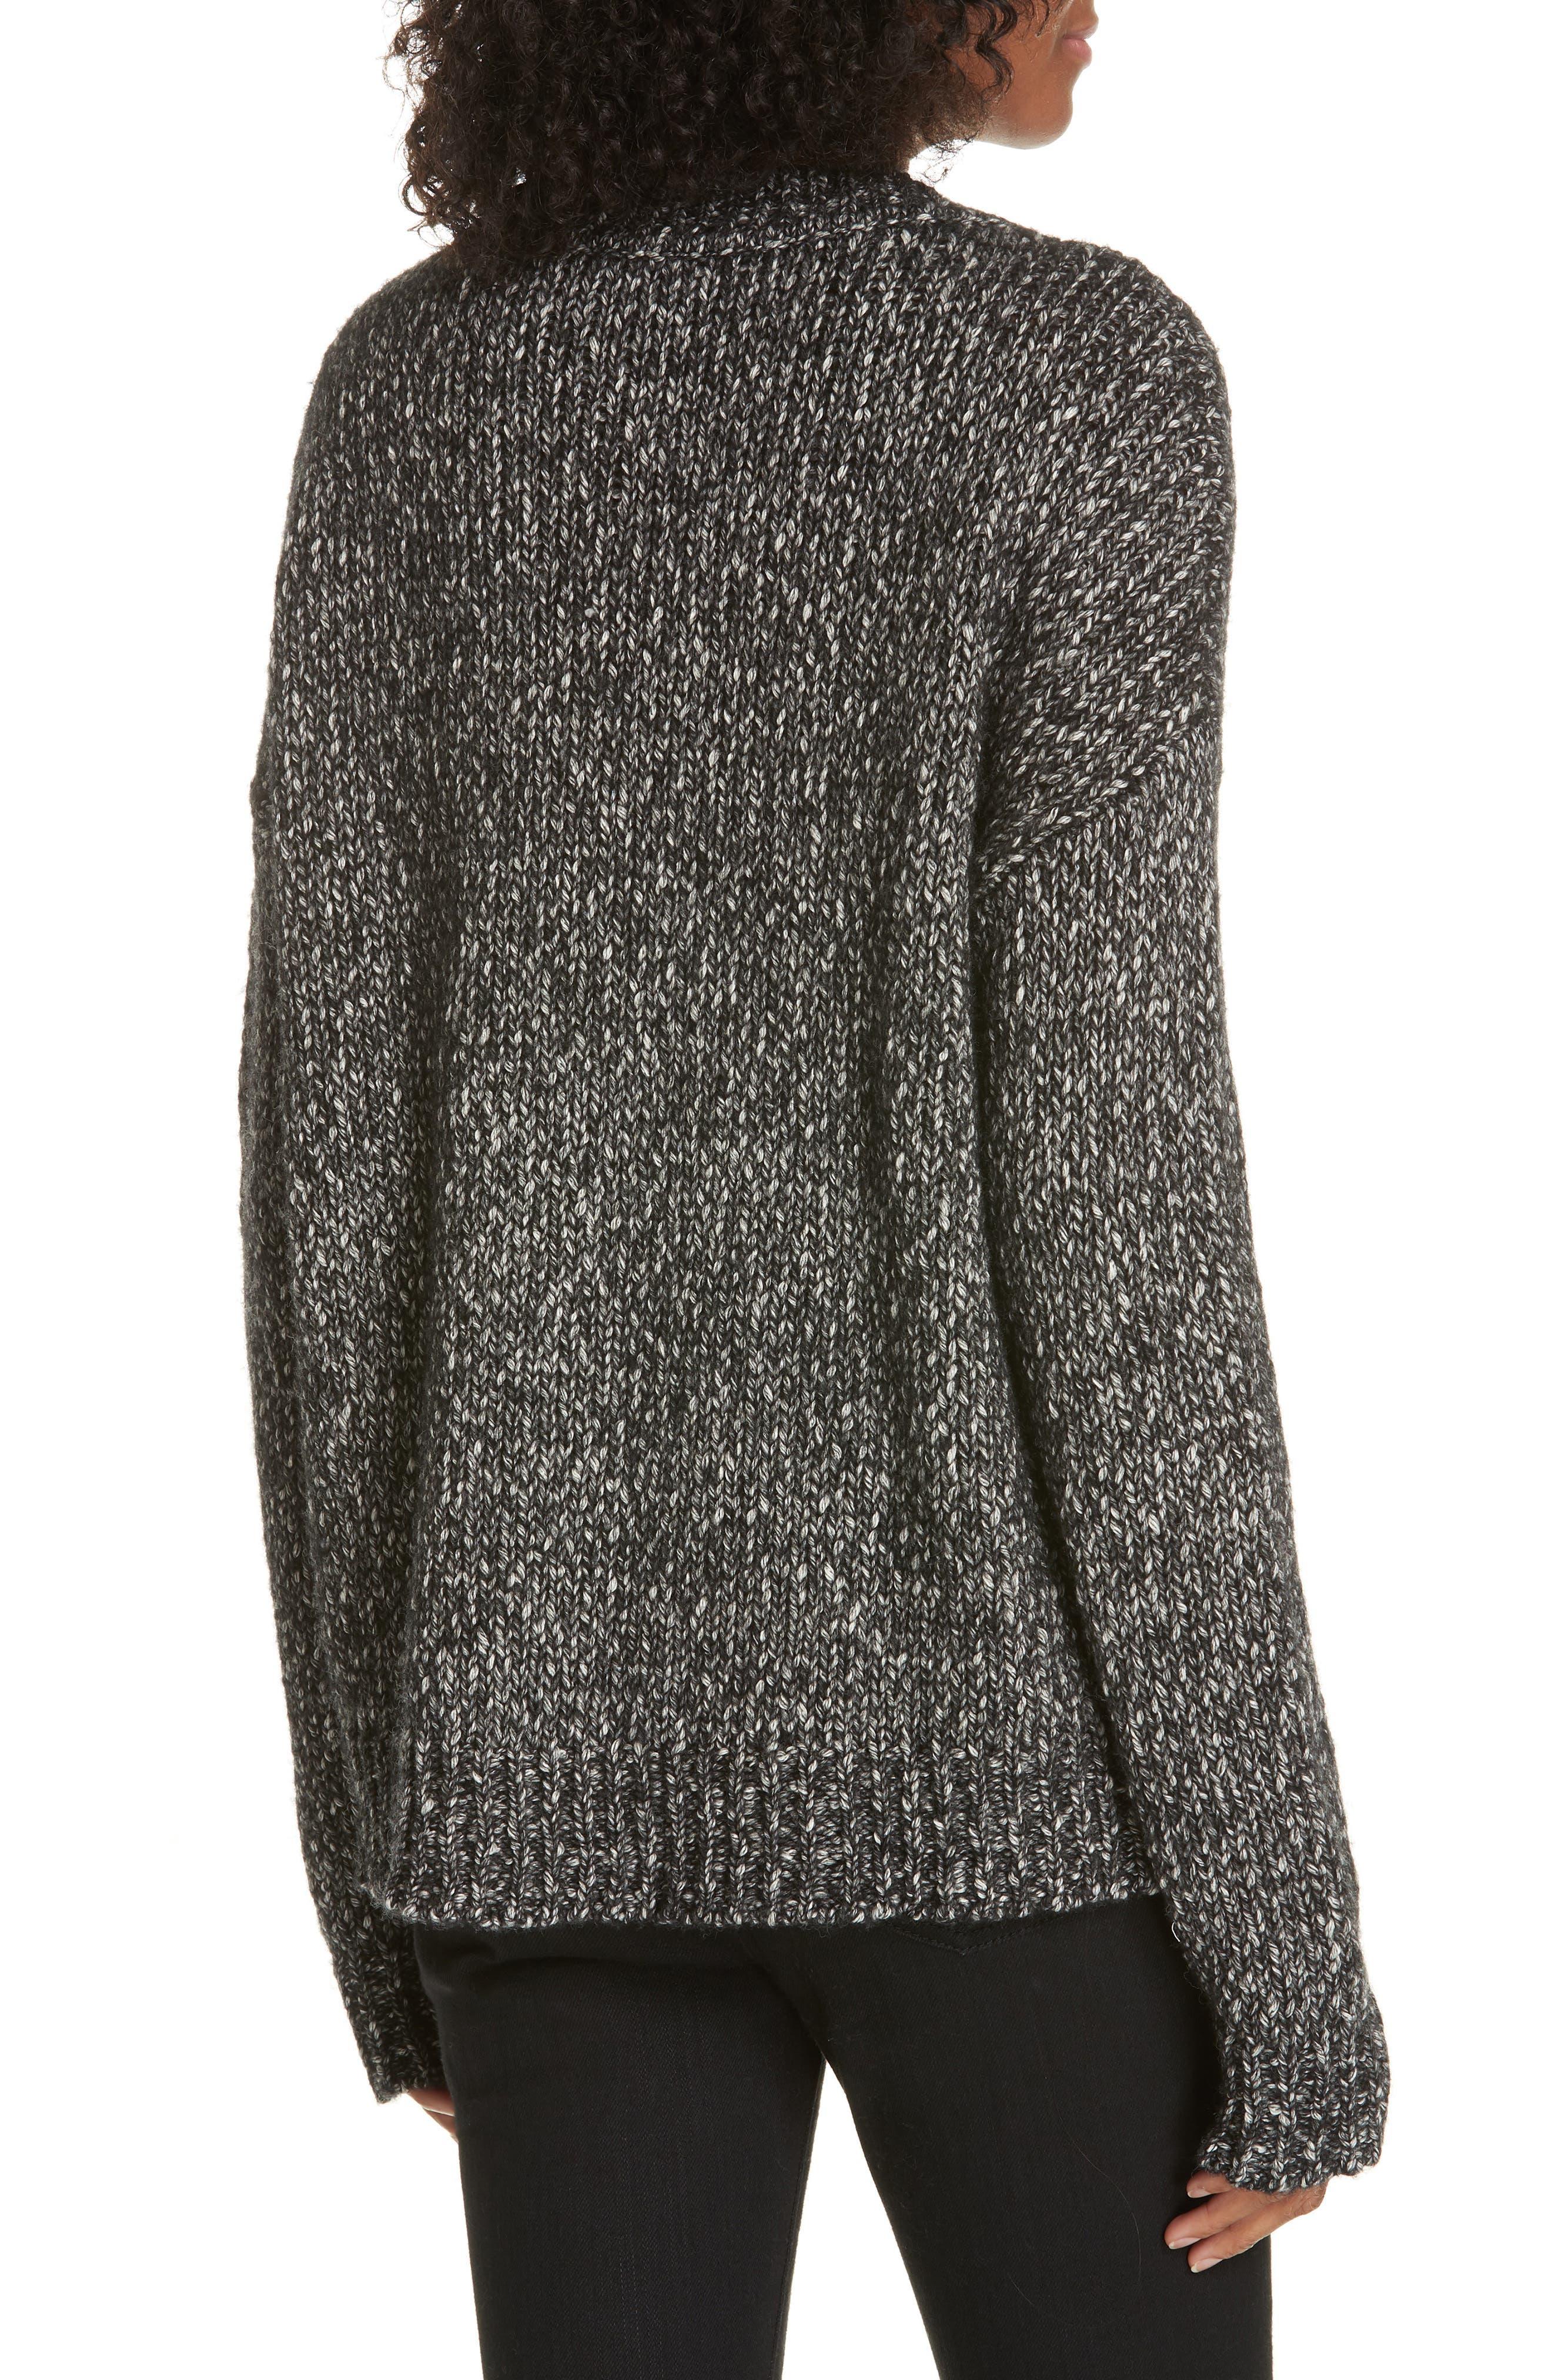 Parkland Slouchy Cotton & Wool Sweater,                             Alternate thumbnail 2, color,                             LEAD MELANGE